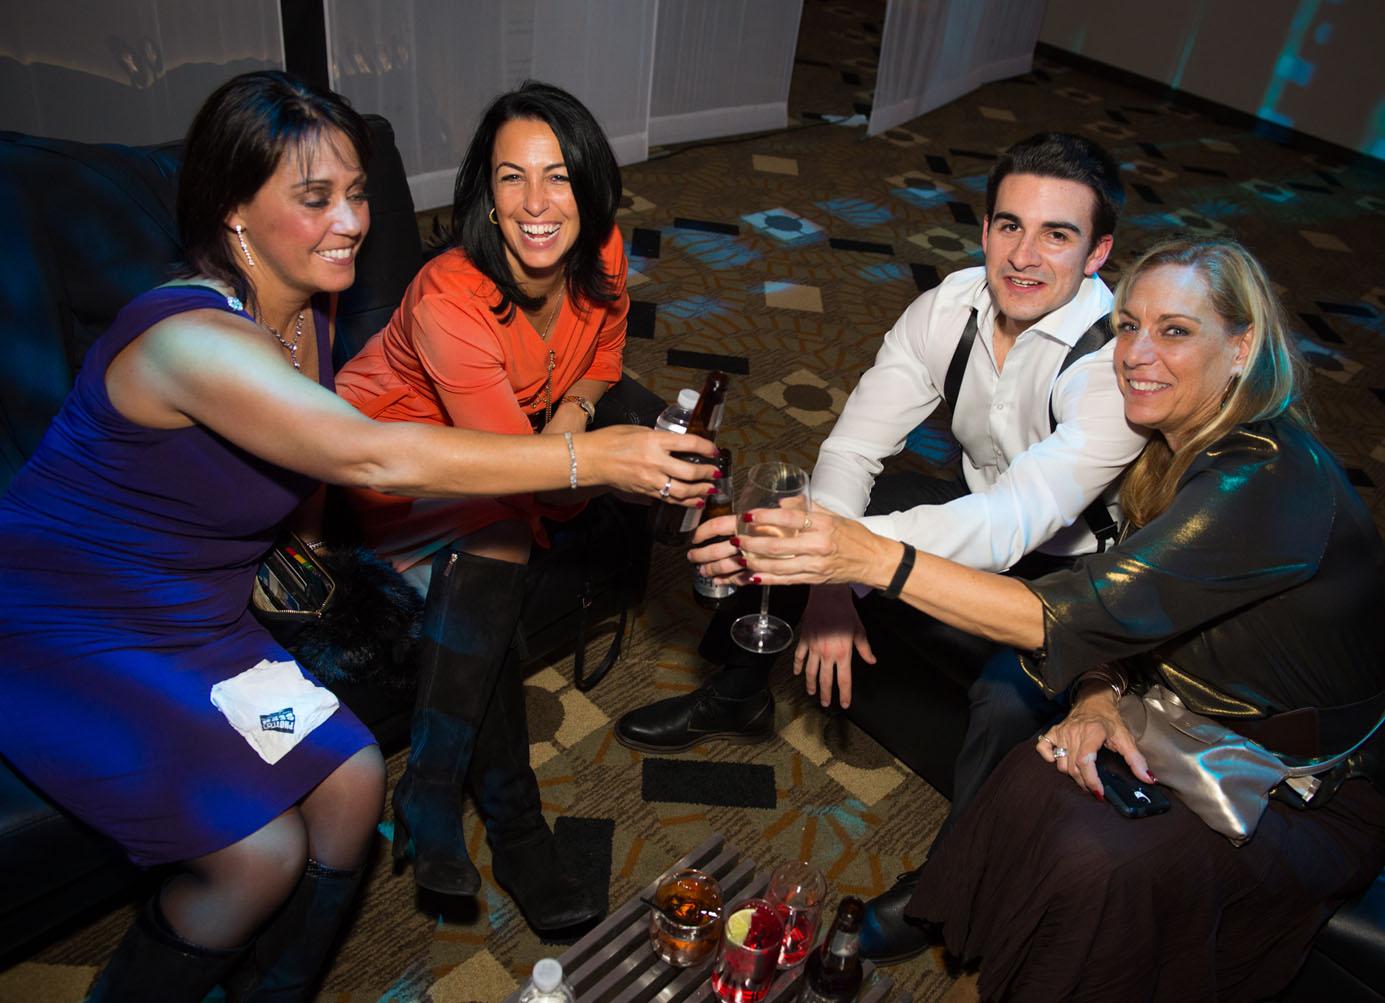 2015-12-09 ReMax Corpoarte Event - The Borgata - Atlantic City NJ - Photo Sesh - 2015-5194.jpg